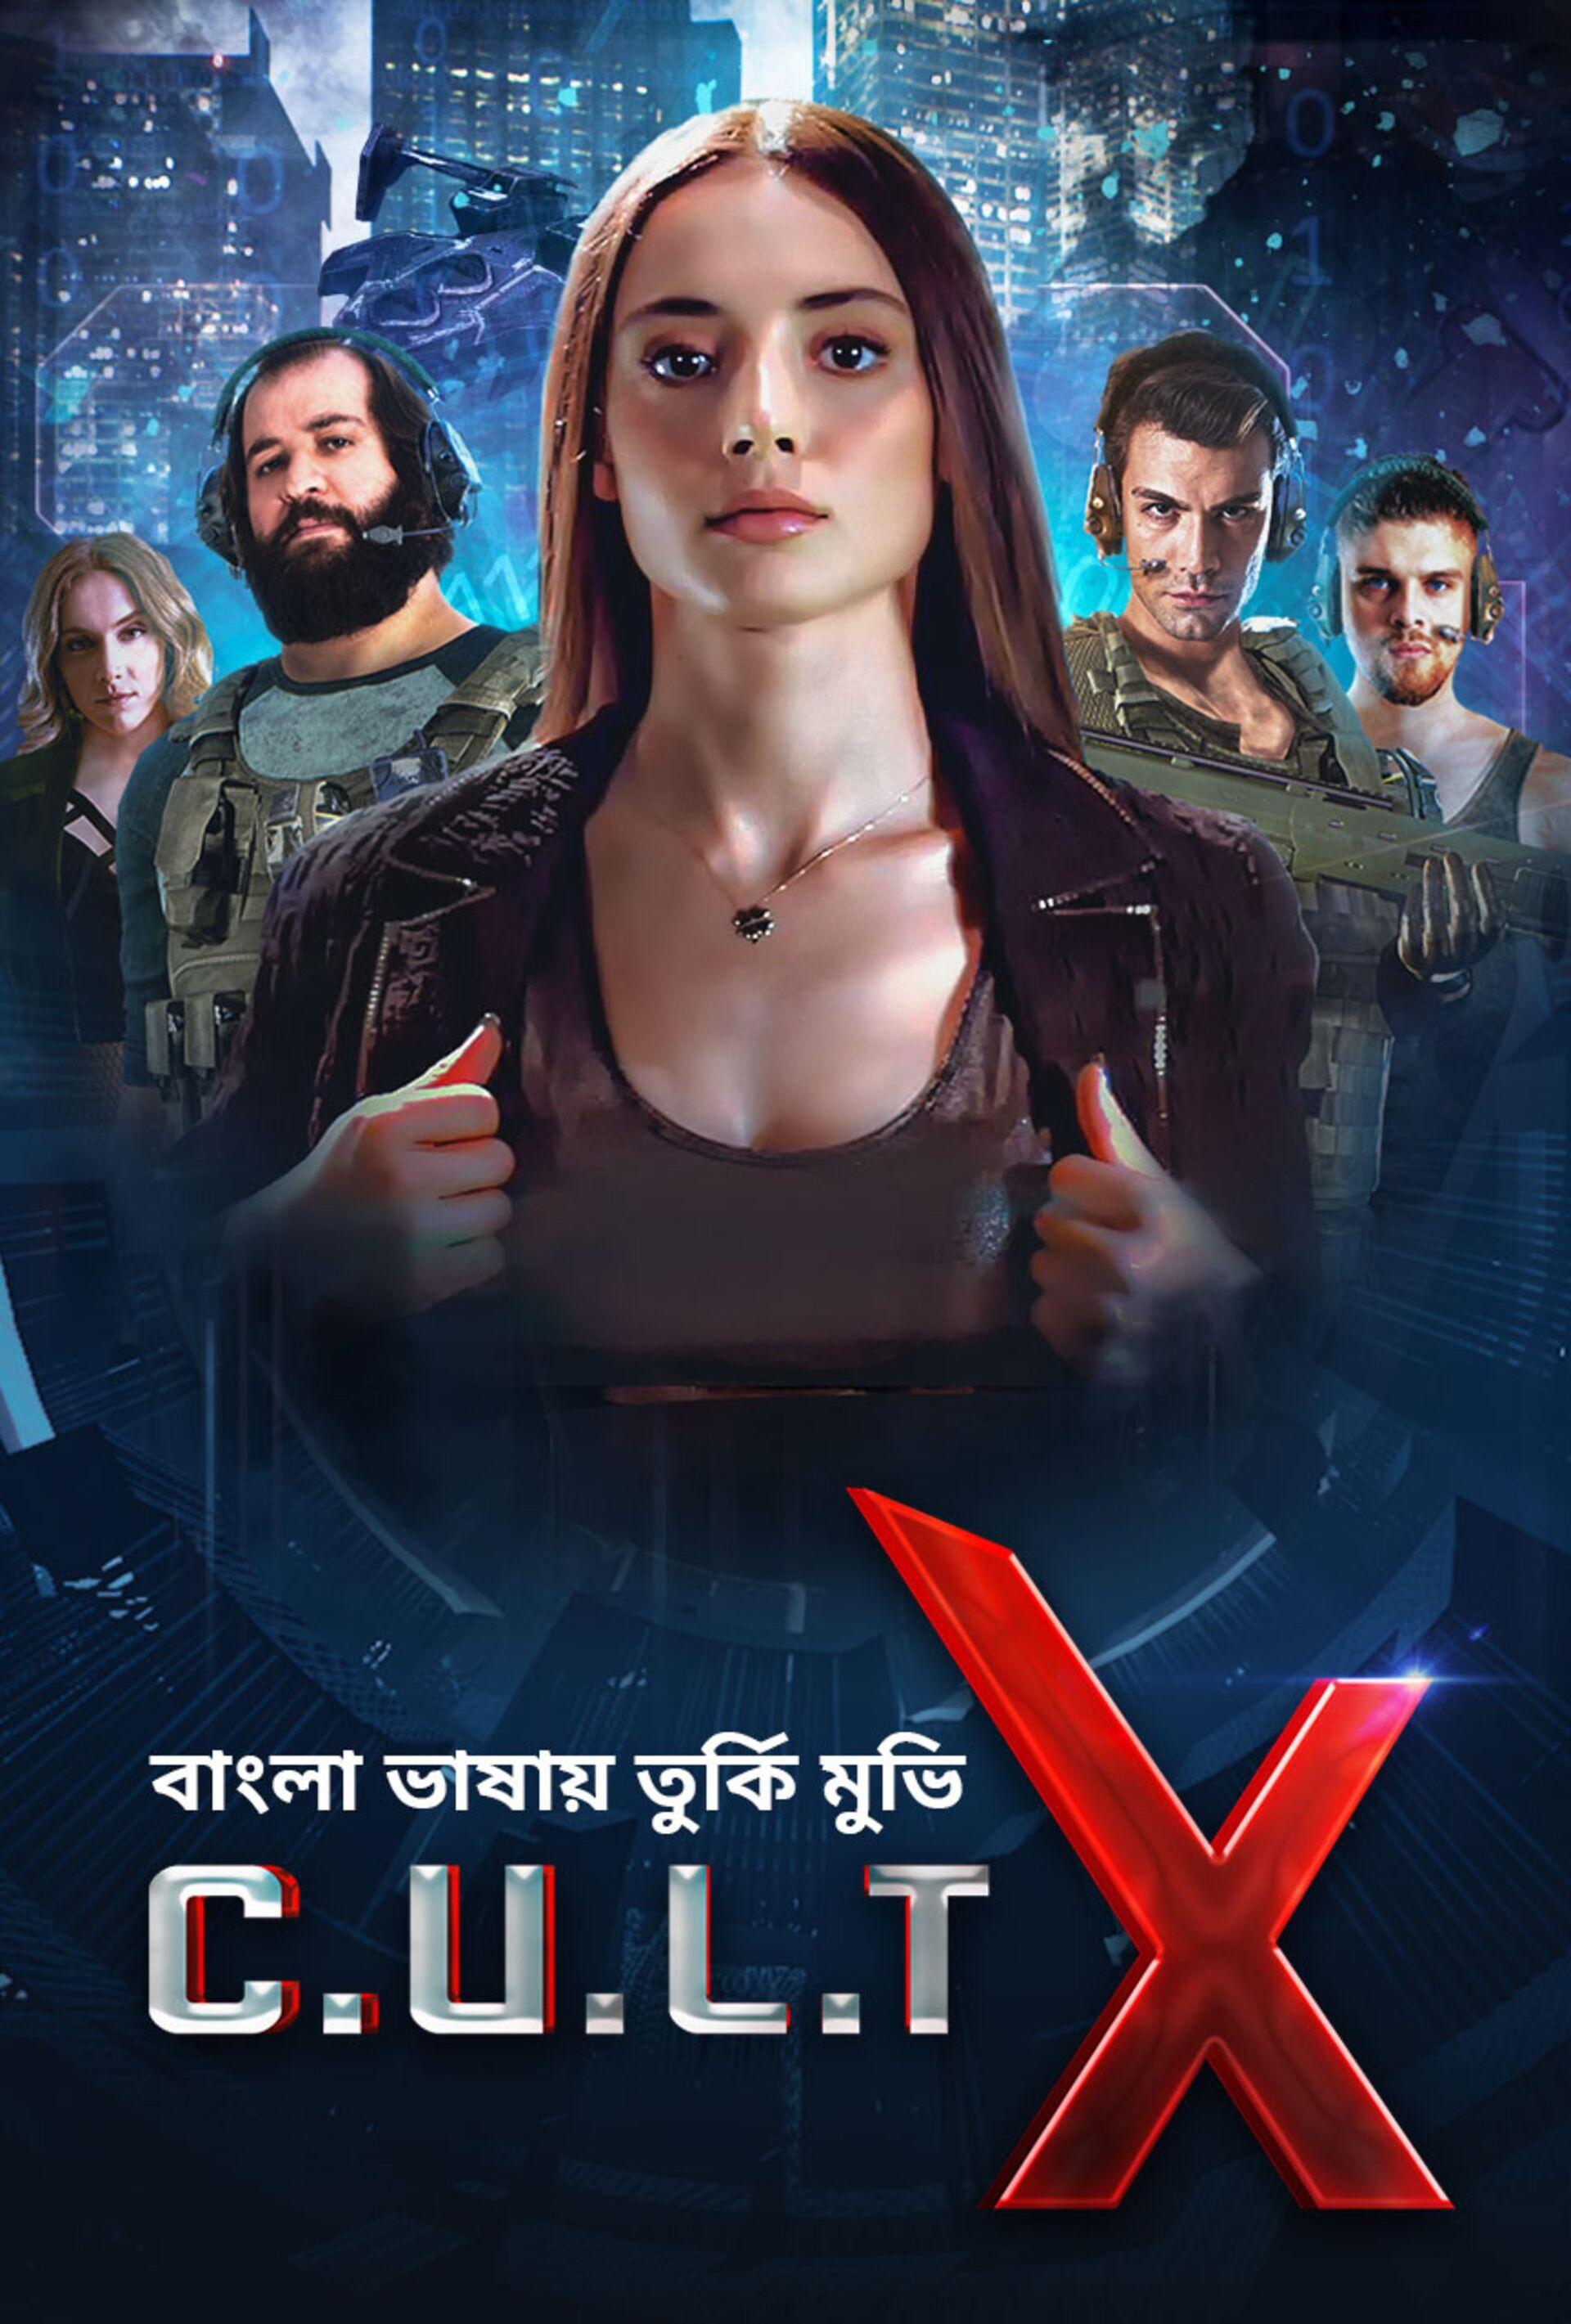 Cult X (2021) Bangla Dubbed Full Movie 480p, 720p, 1080p Download